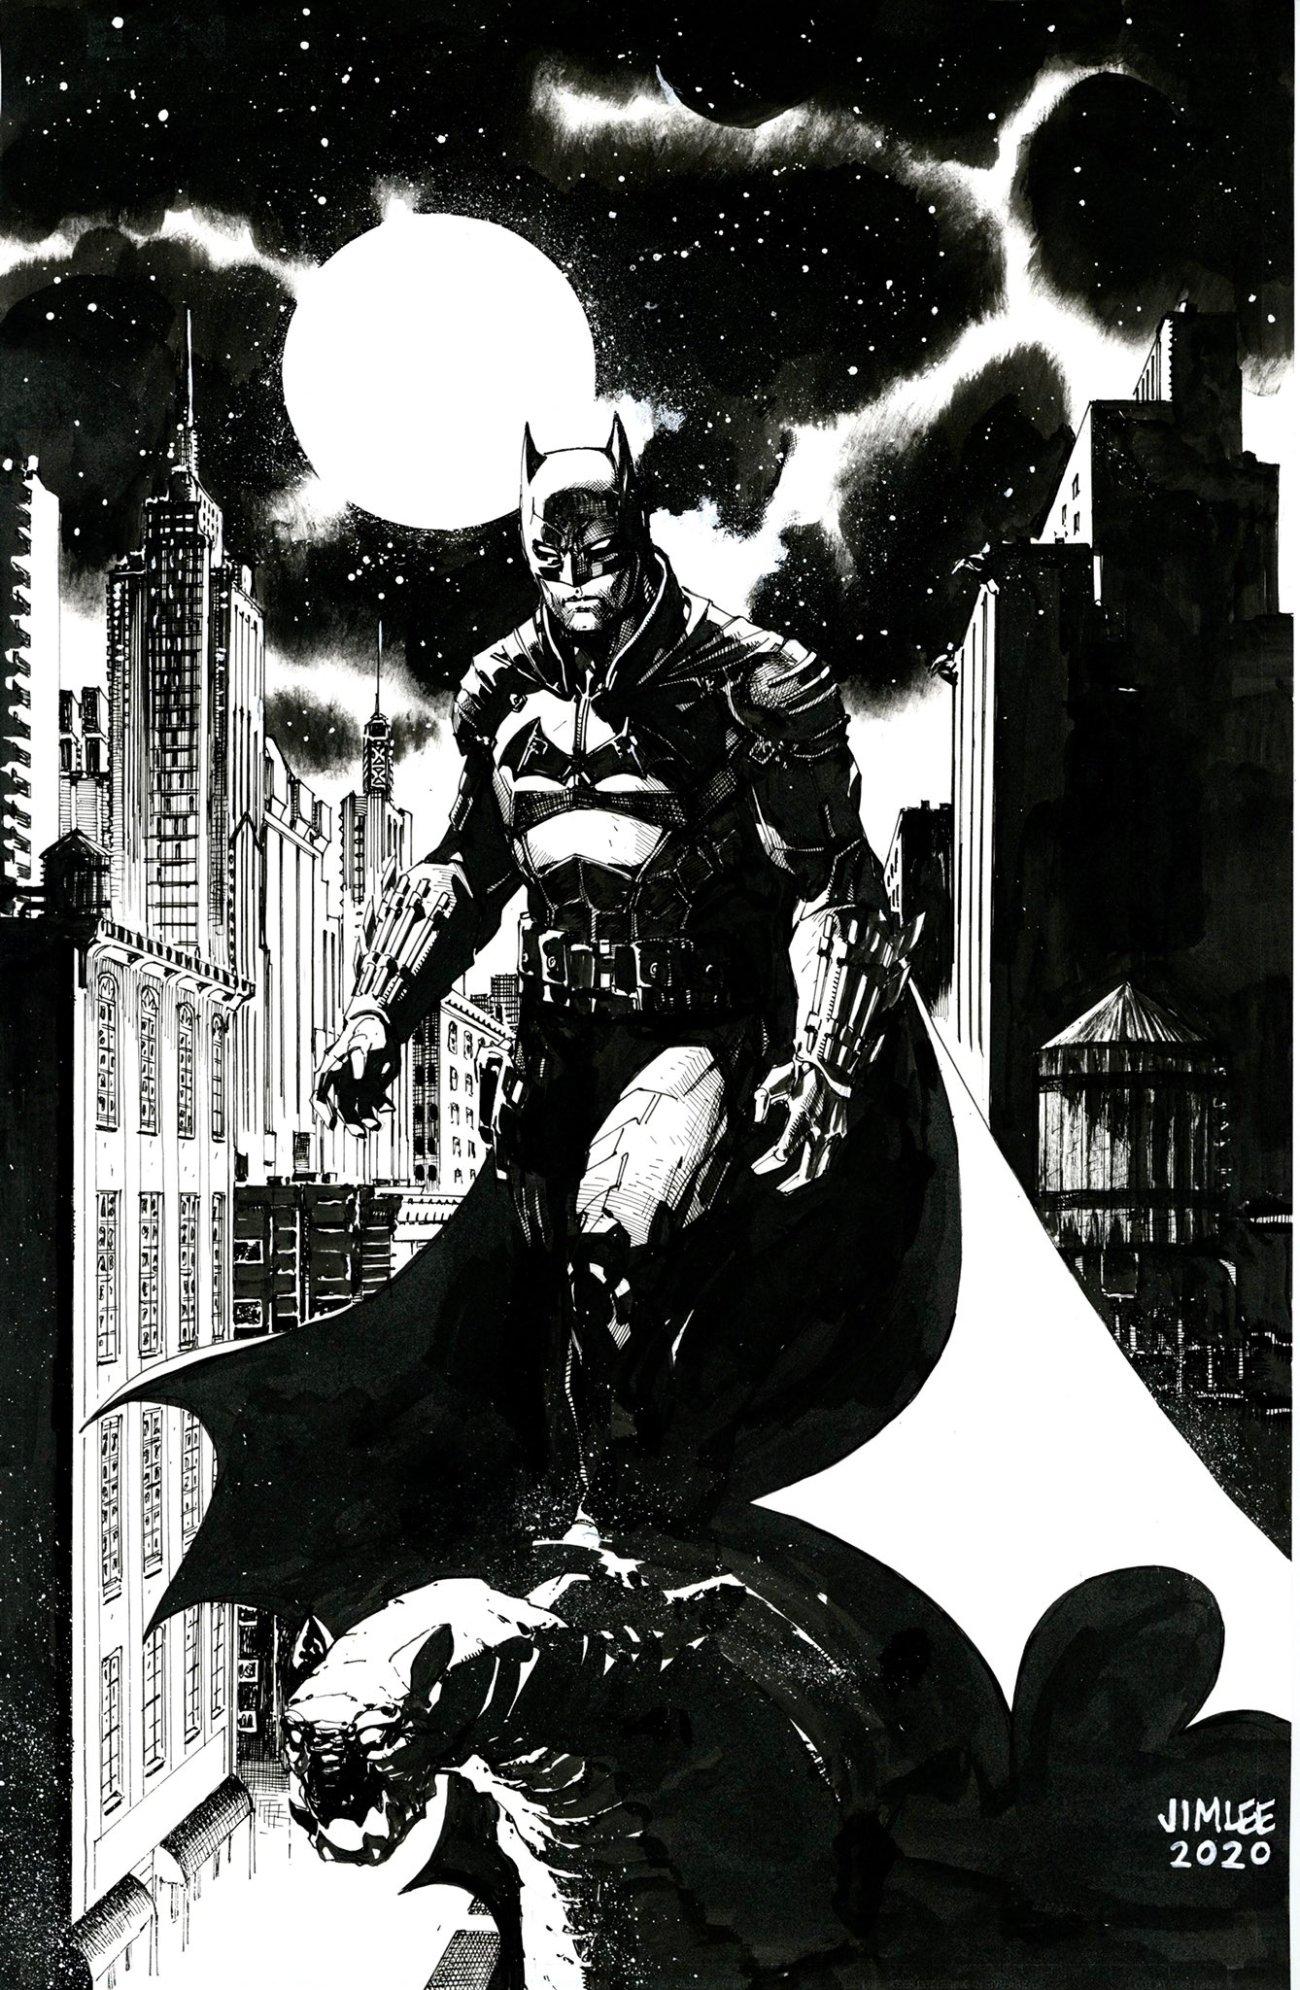 Sketch del póster de The Batman (2022) para DC FanDome 2020 por el artista Jim Lee. Imagen: Jim Lee Twitter (@JimLee).